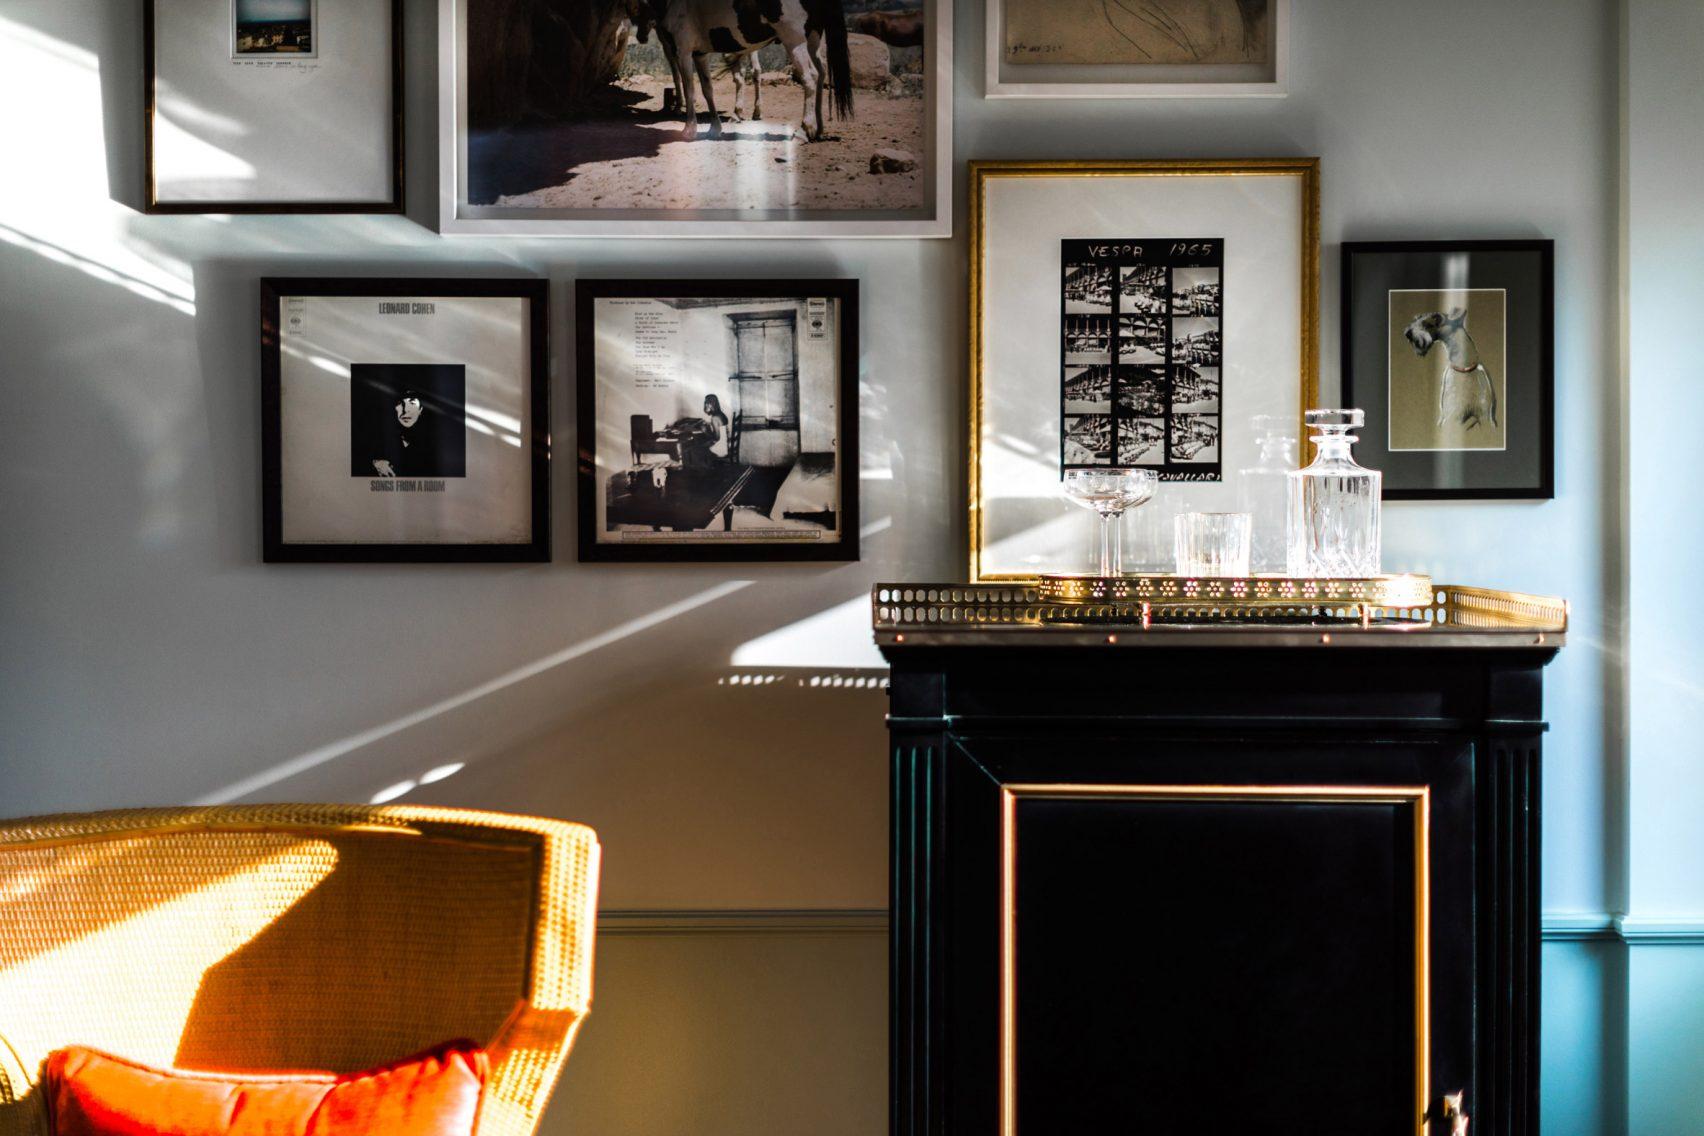 nomad-hotel-los-angeles-jacques-garcia-usa-interiors_dezeen_2364_col_3-1704x1136